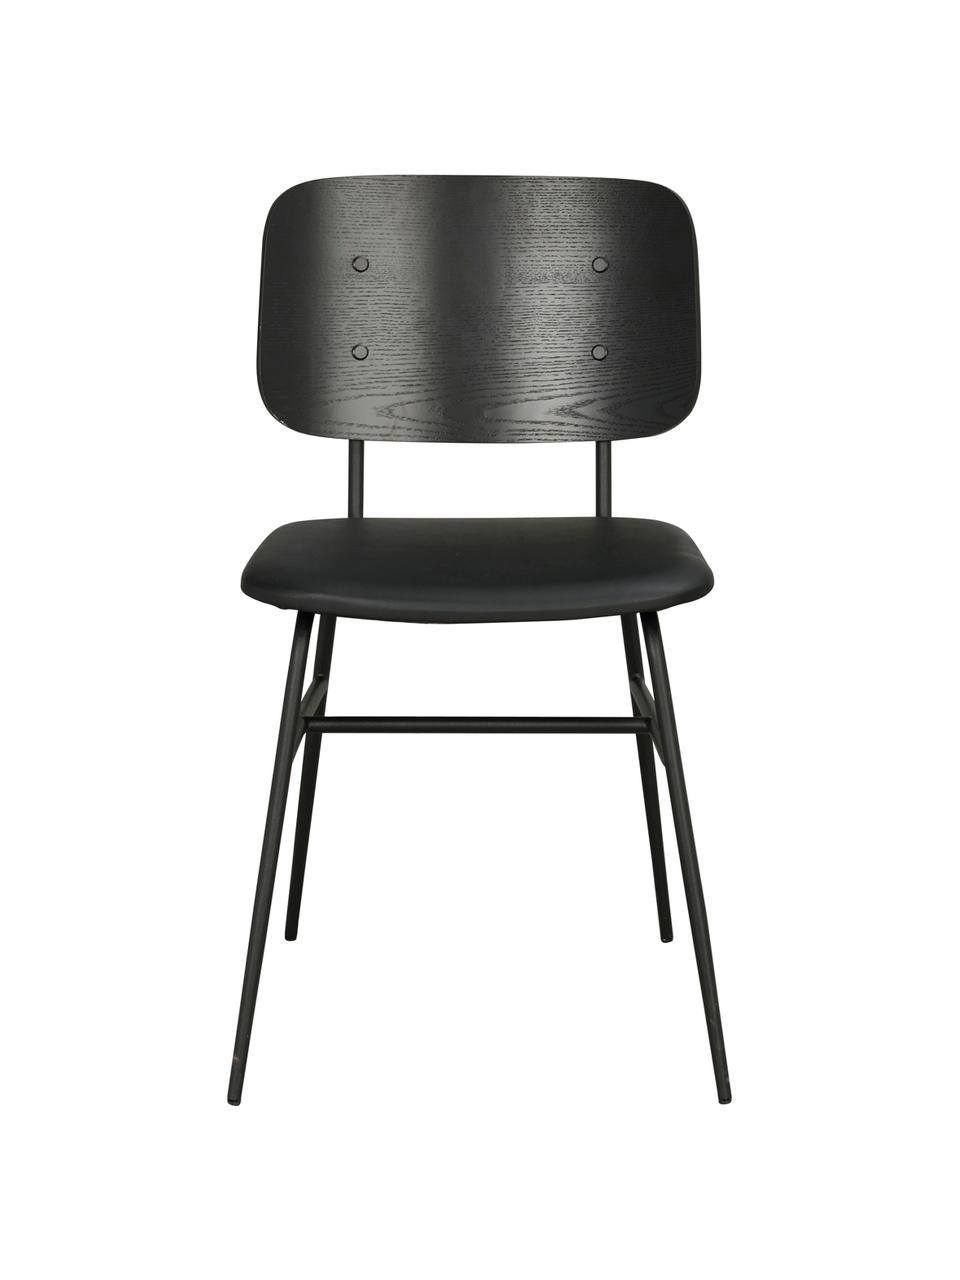 Sedia in legno Brent, Seduta: similpelle (poliuretano), Struttura: metallo verniciato, Nero opaco, Larg. 47 x Prof. 57 cm